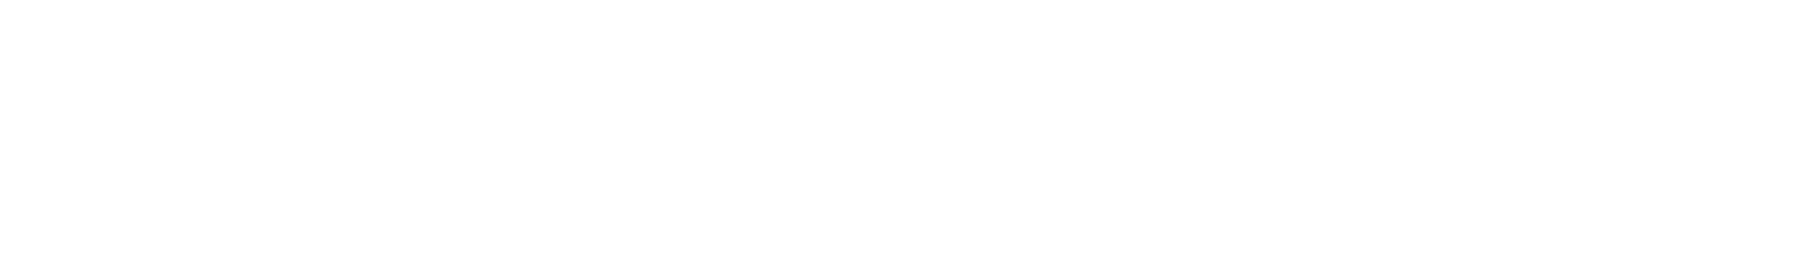 seq5 130